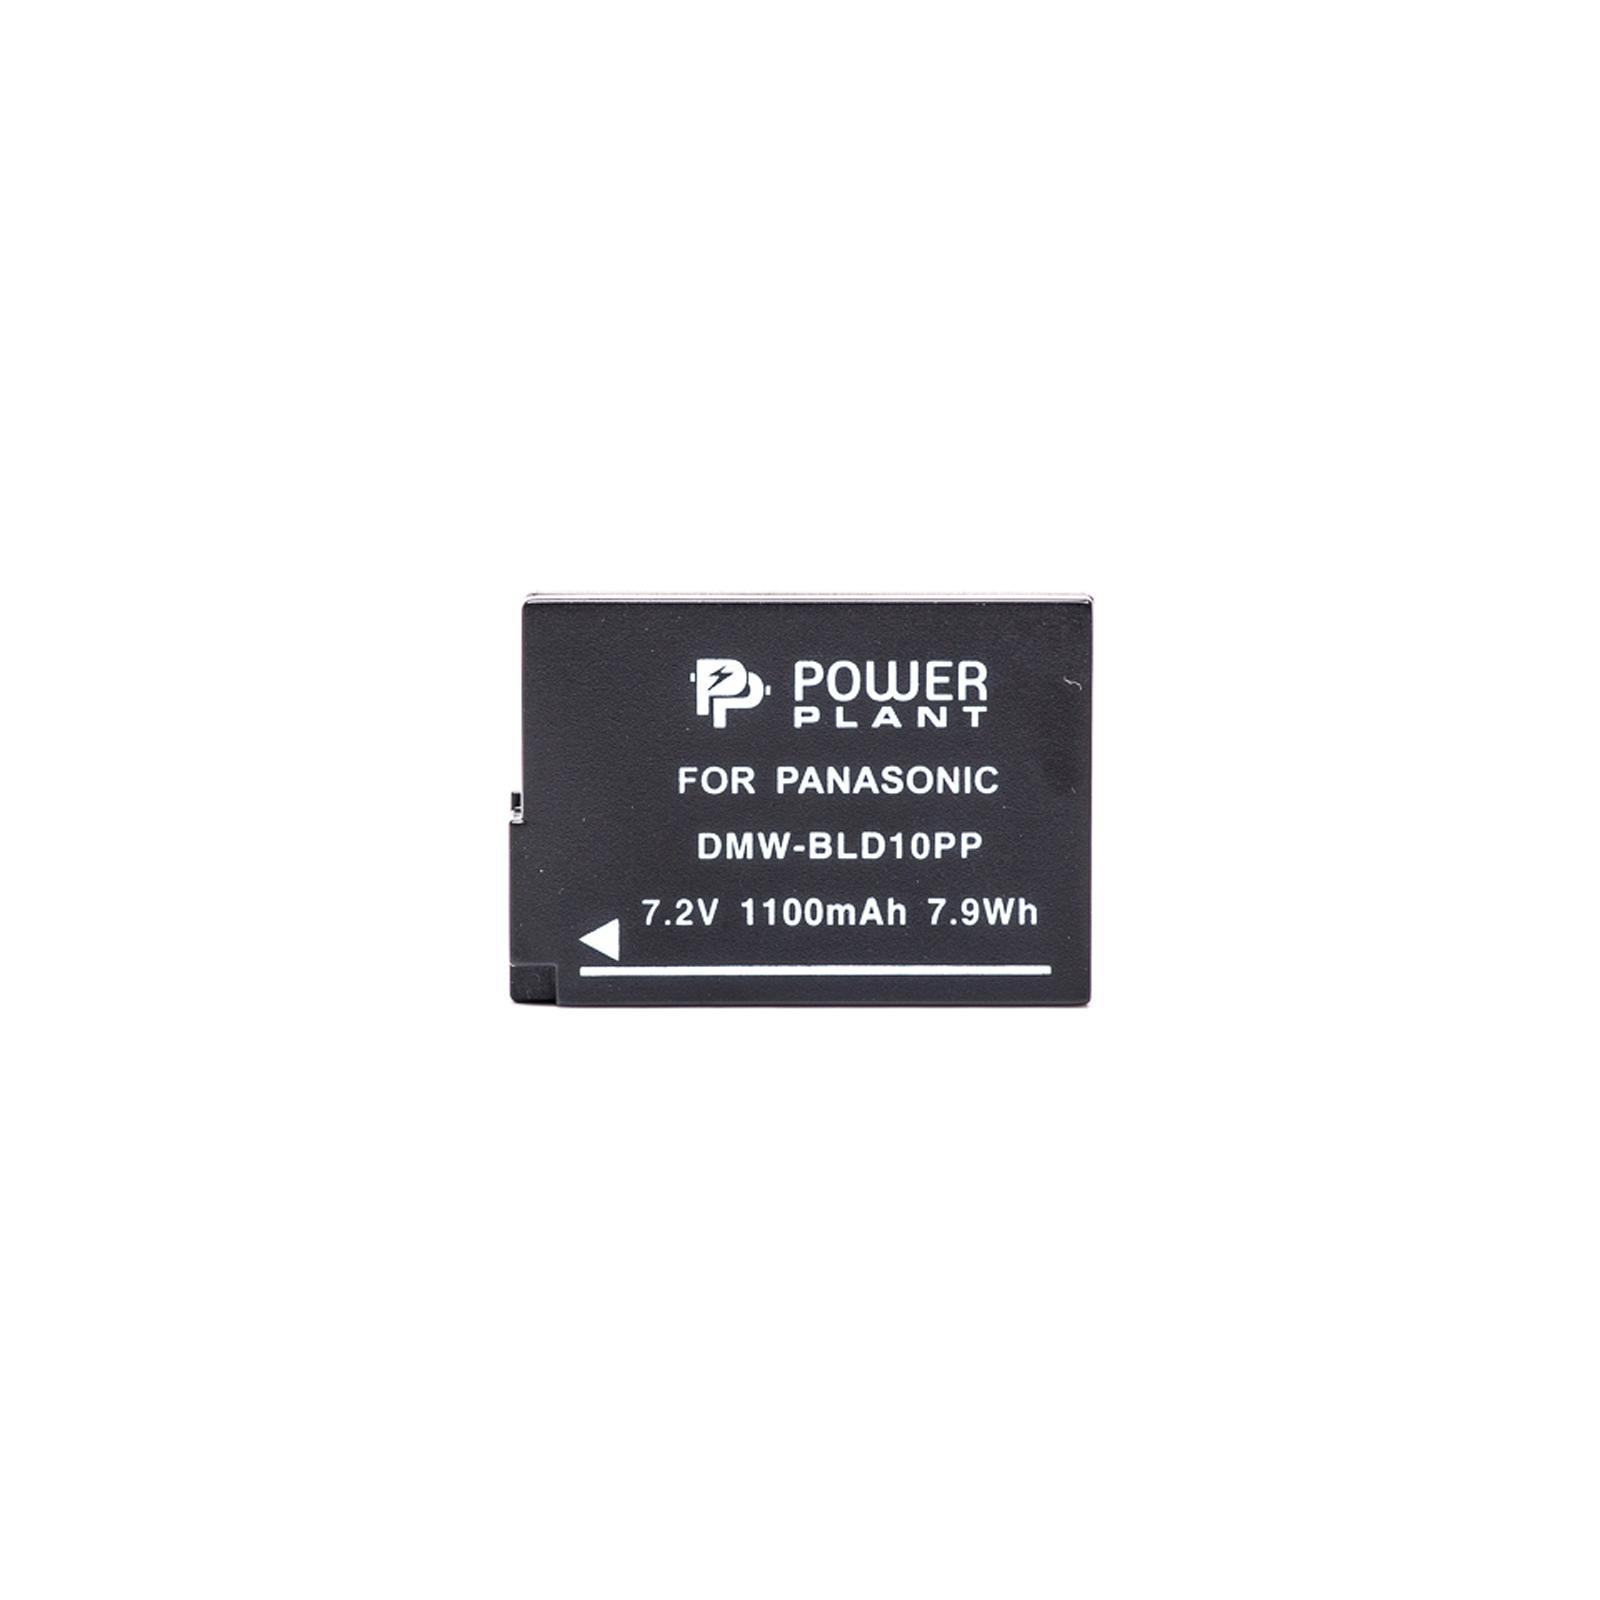 Аккумулятор к фото/видео PowerPlant Panasonic DMW-BLD10PP (DV00DV1298) изображение 2